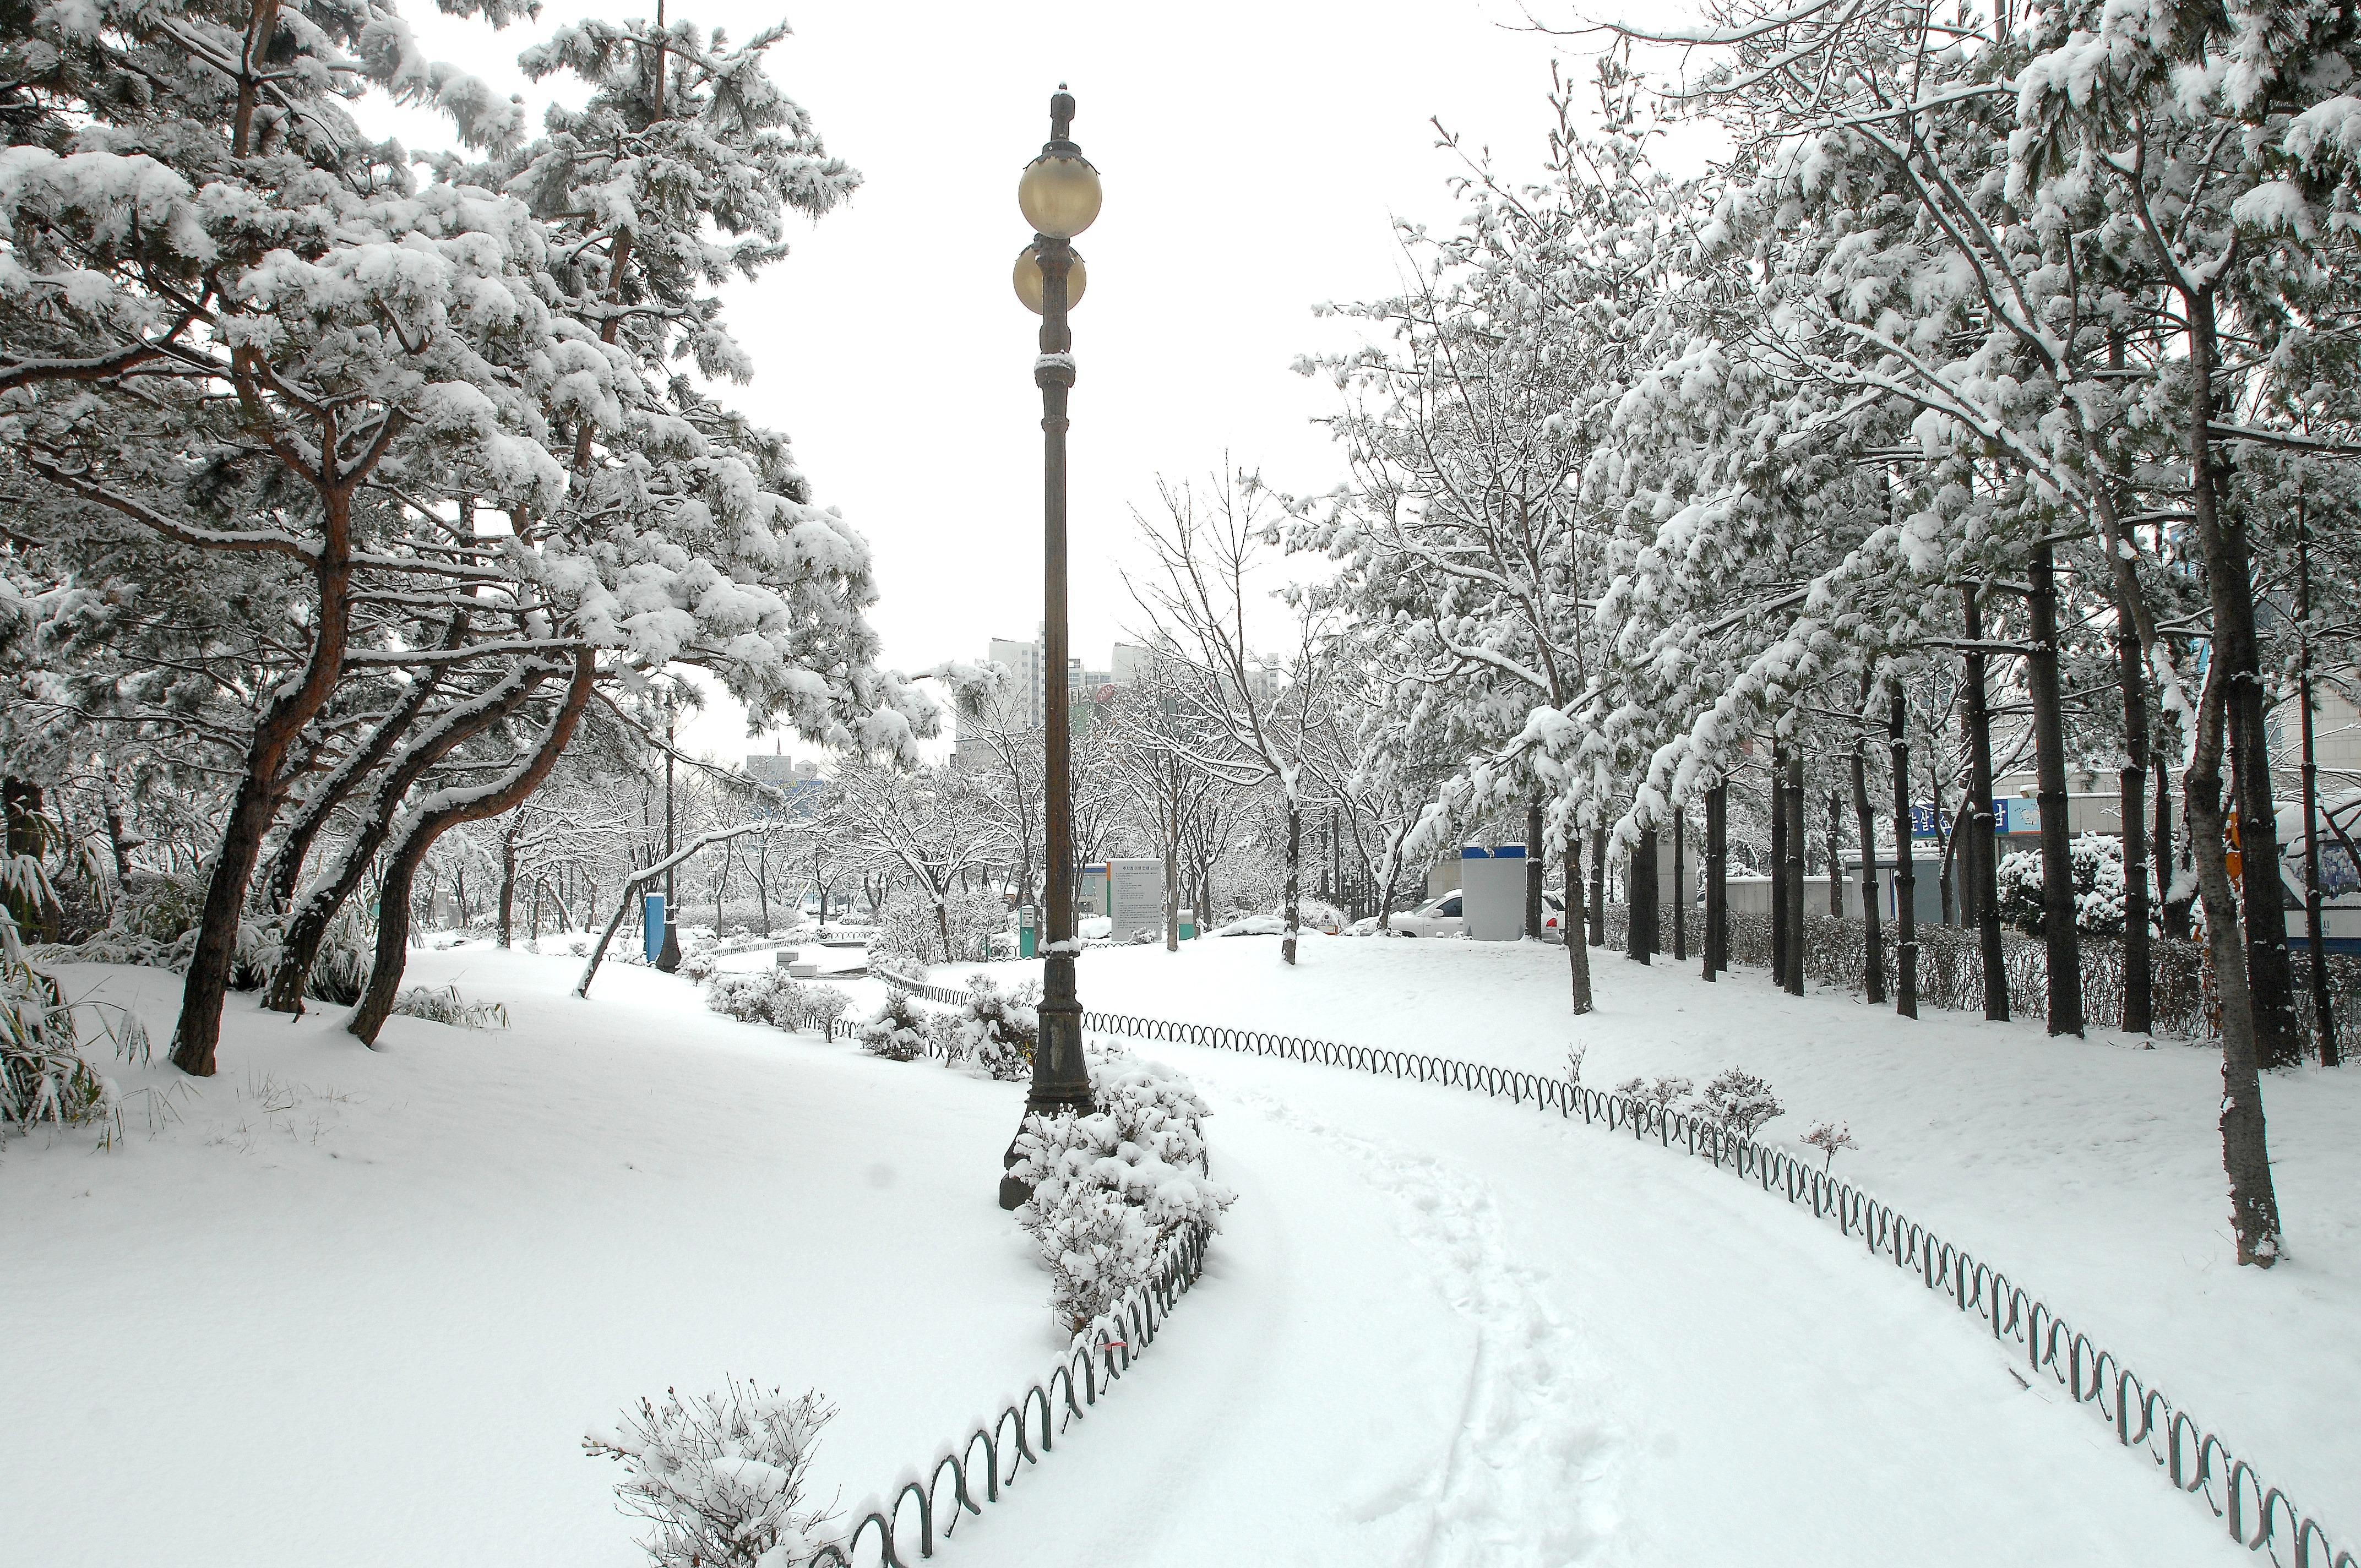 free images snow weather season blizzard freezing